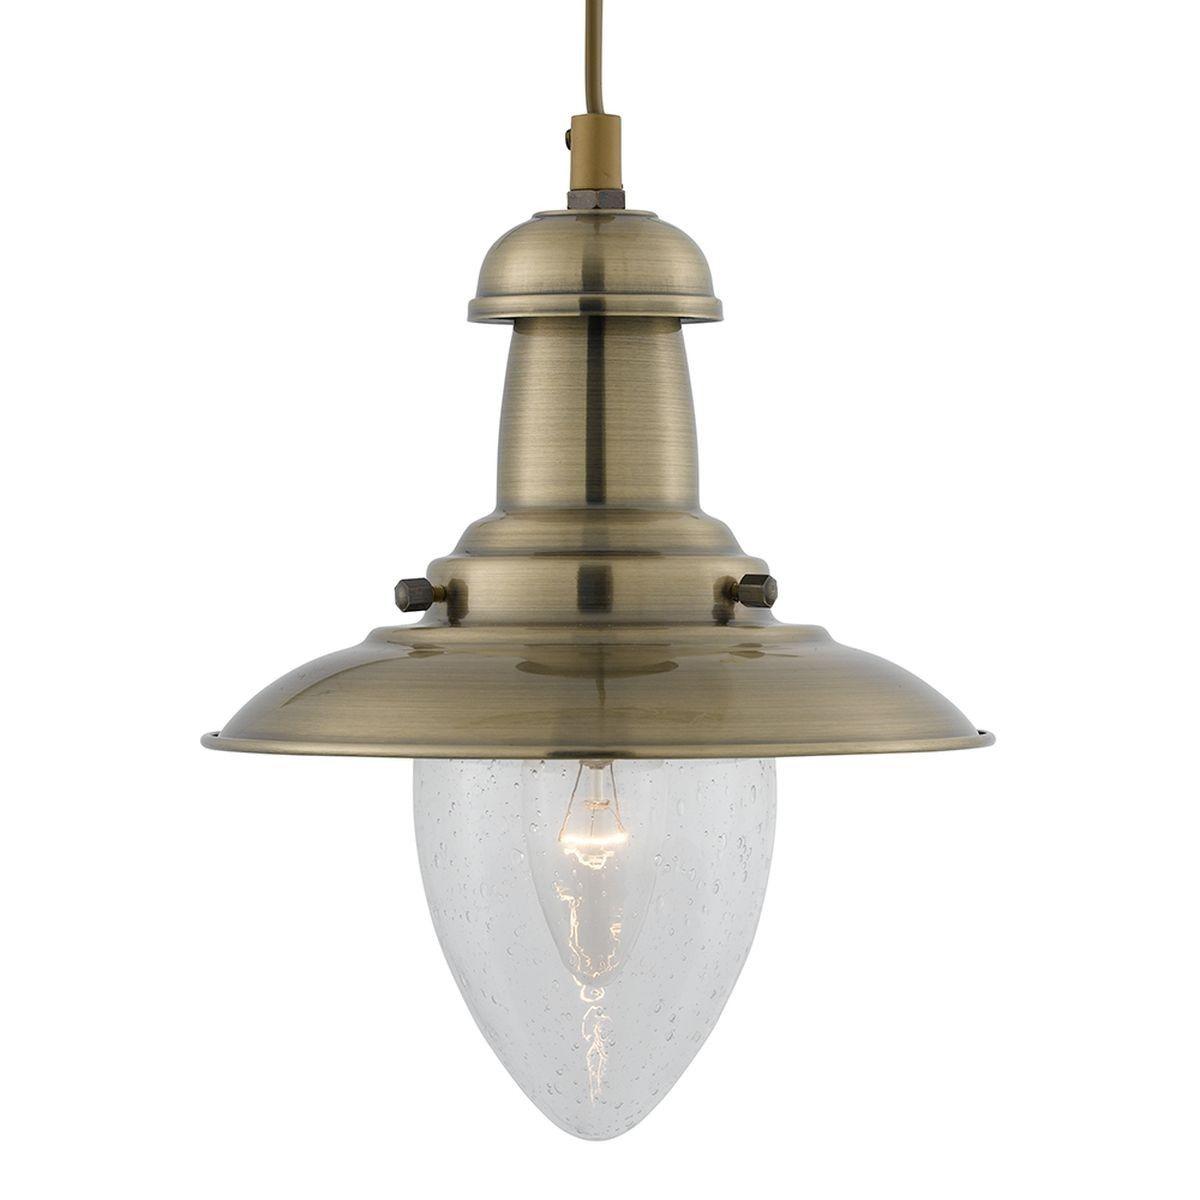 Antique Brass Bathroom Lighting - Brass fisherman lantern ceiling light antique brass